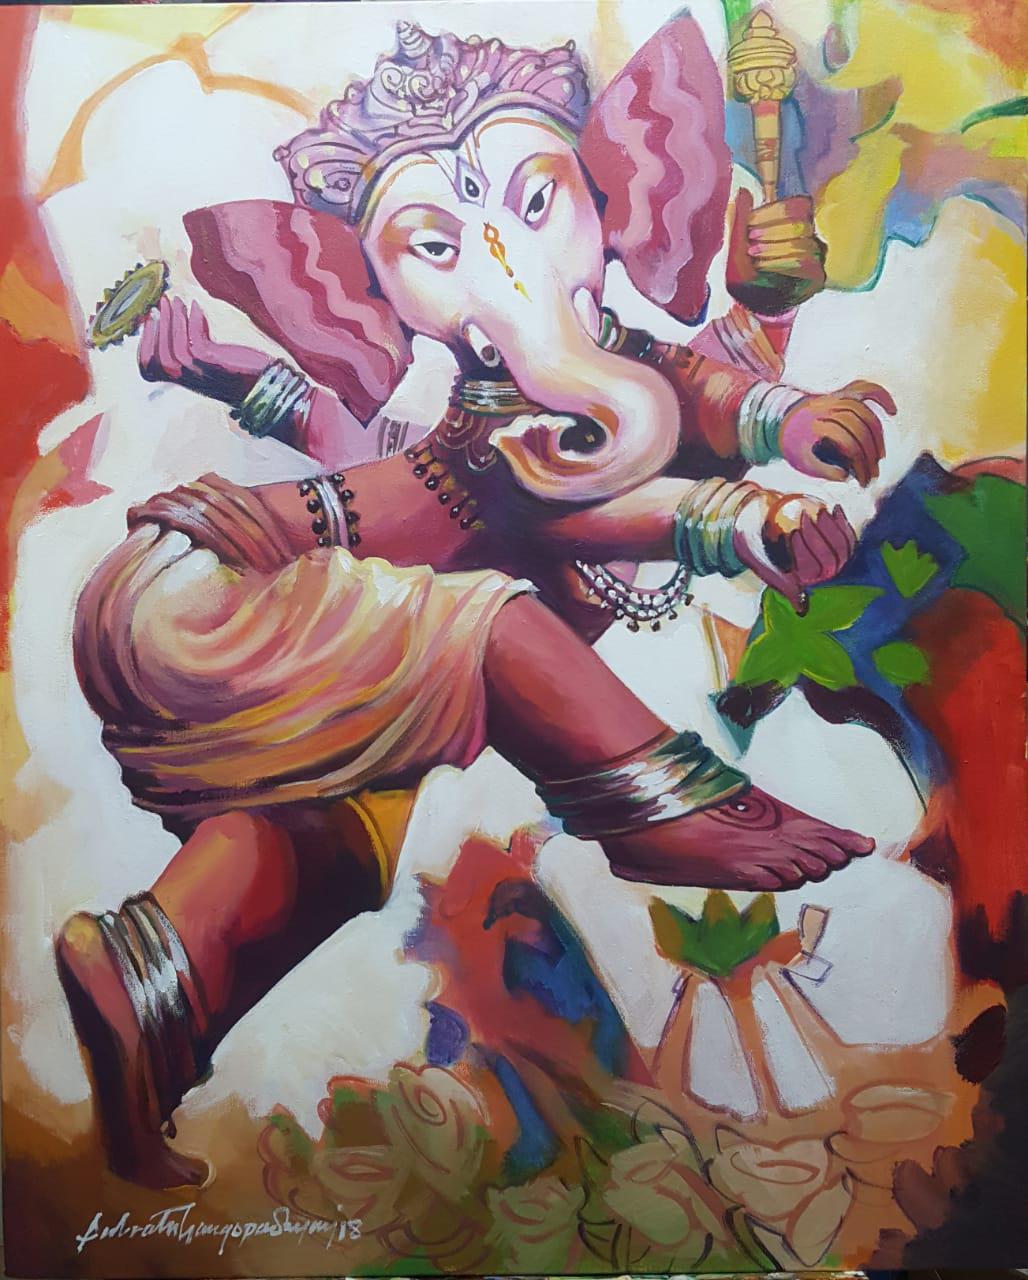 Subrata Gangopadhyay 1